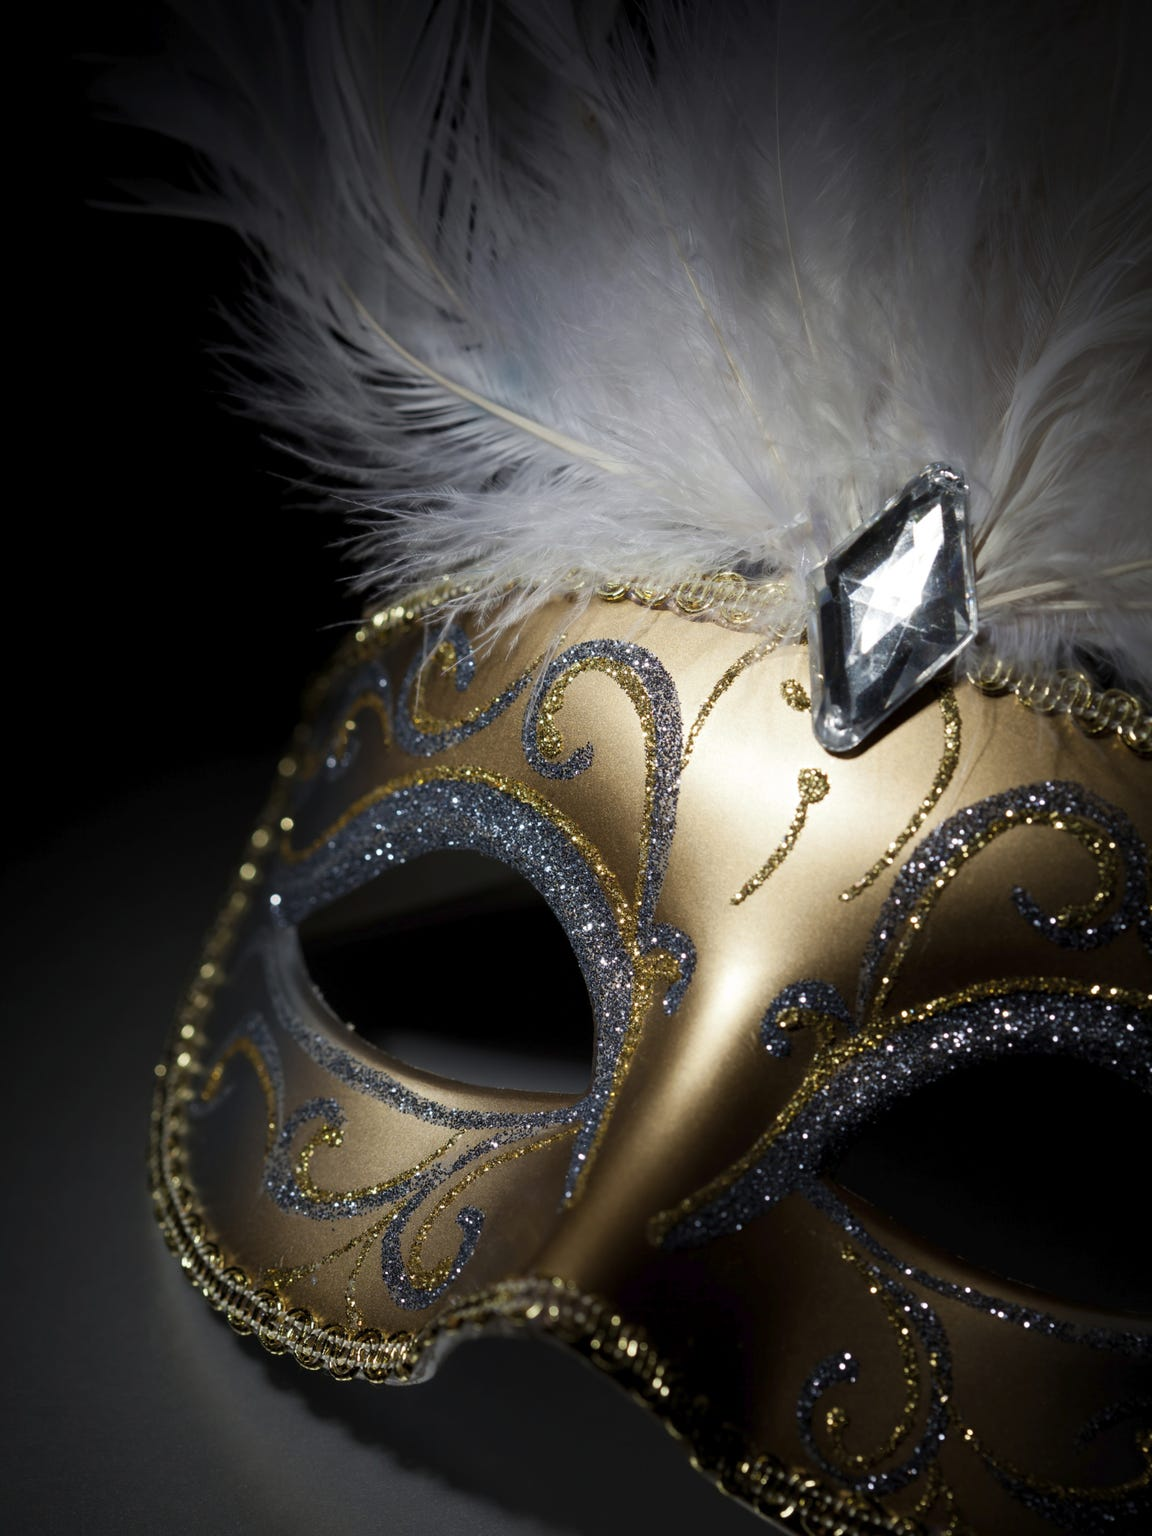 Murfreesboro Symphony Orchestra's Masquerade Ball is